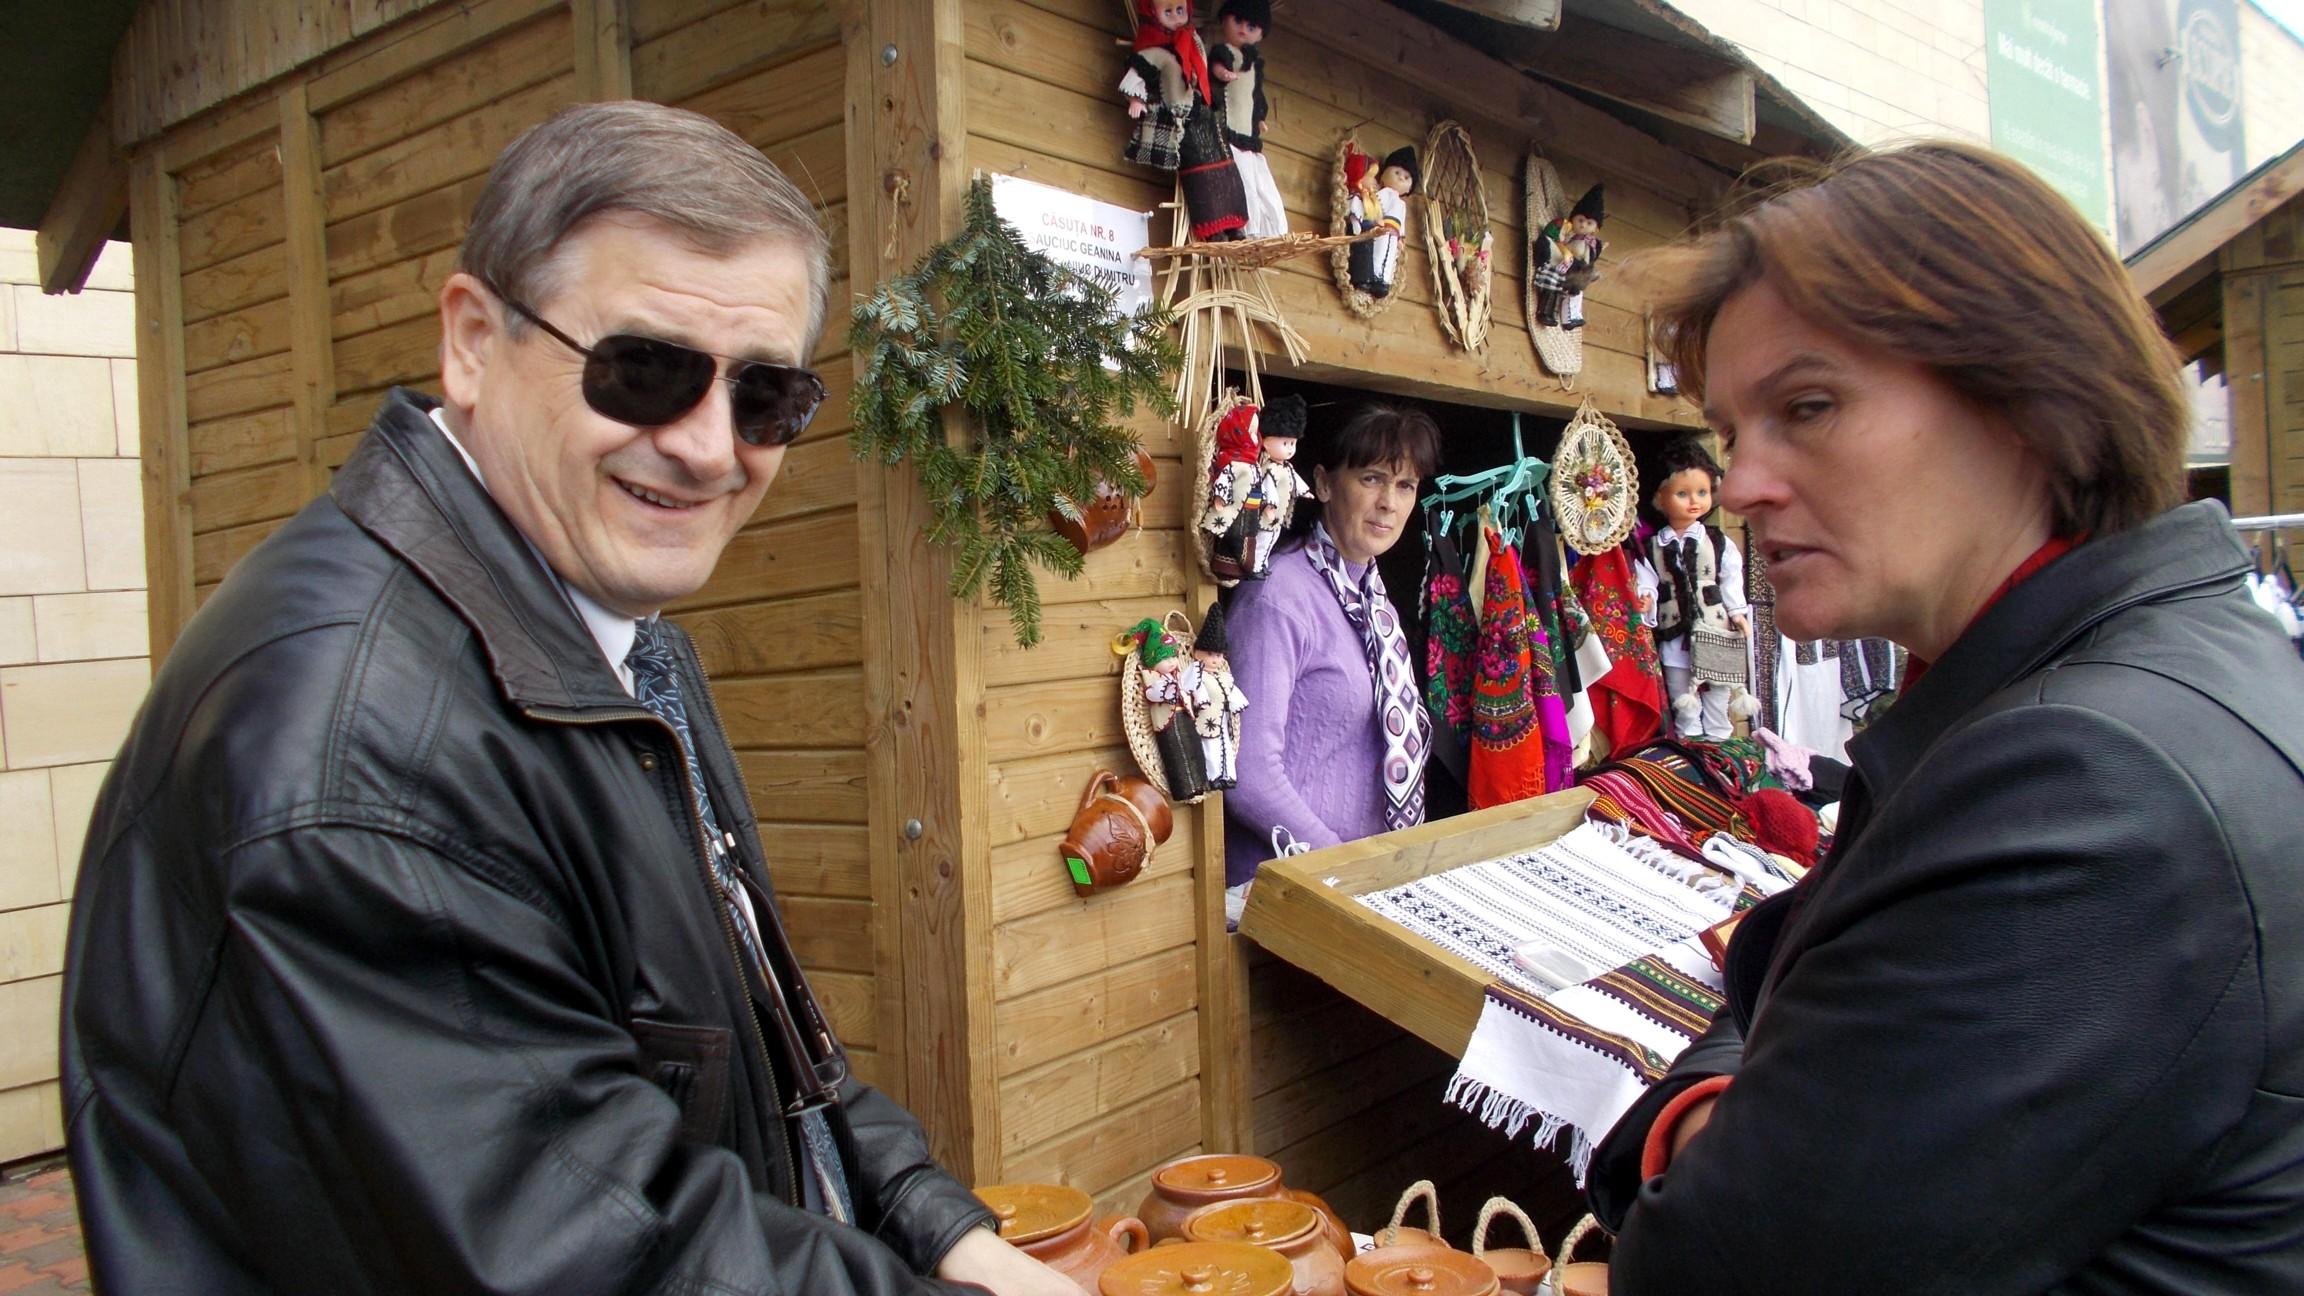 Domnul Manager Viorel Varvaroi, zâmbindu-vă